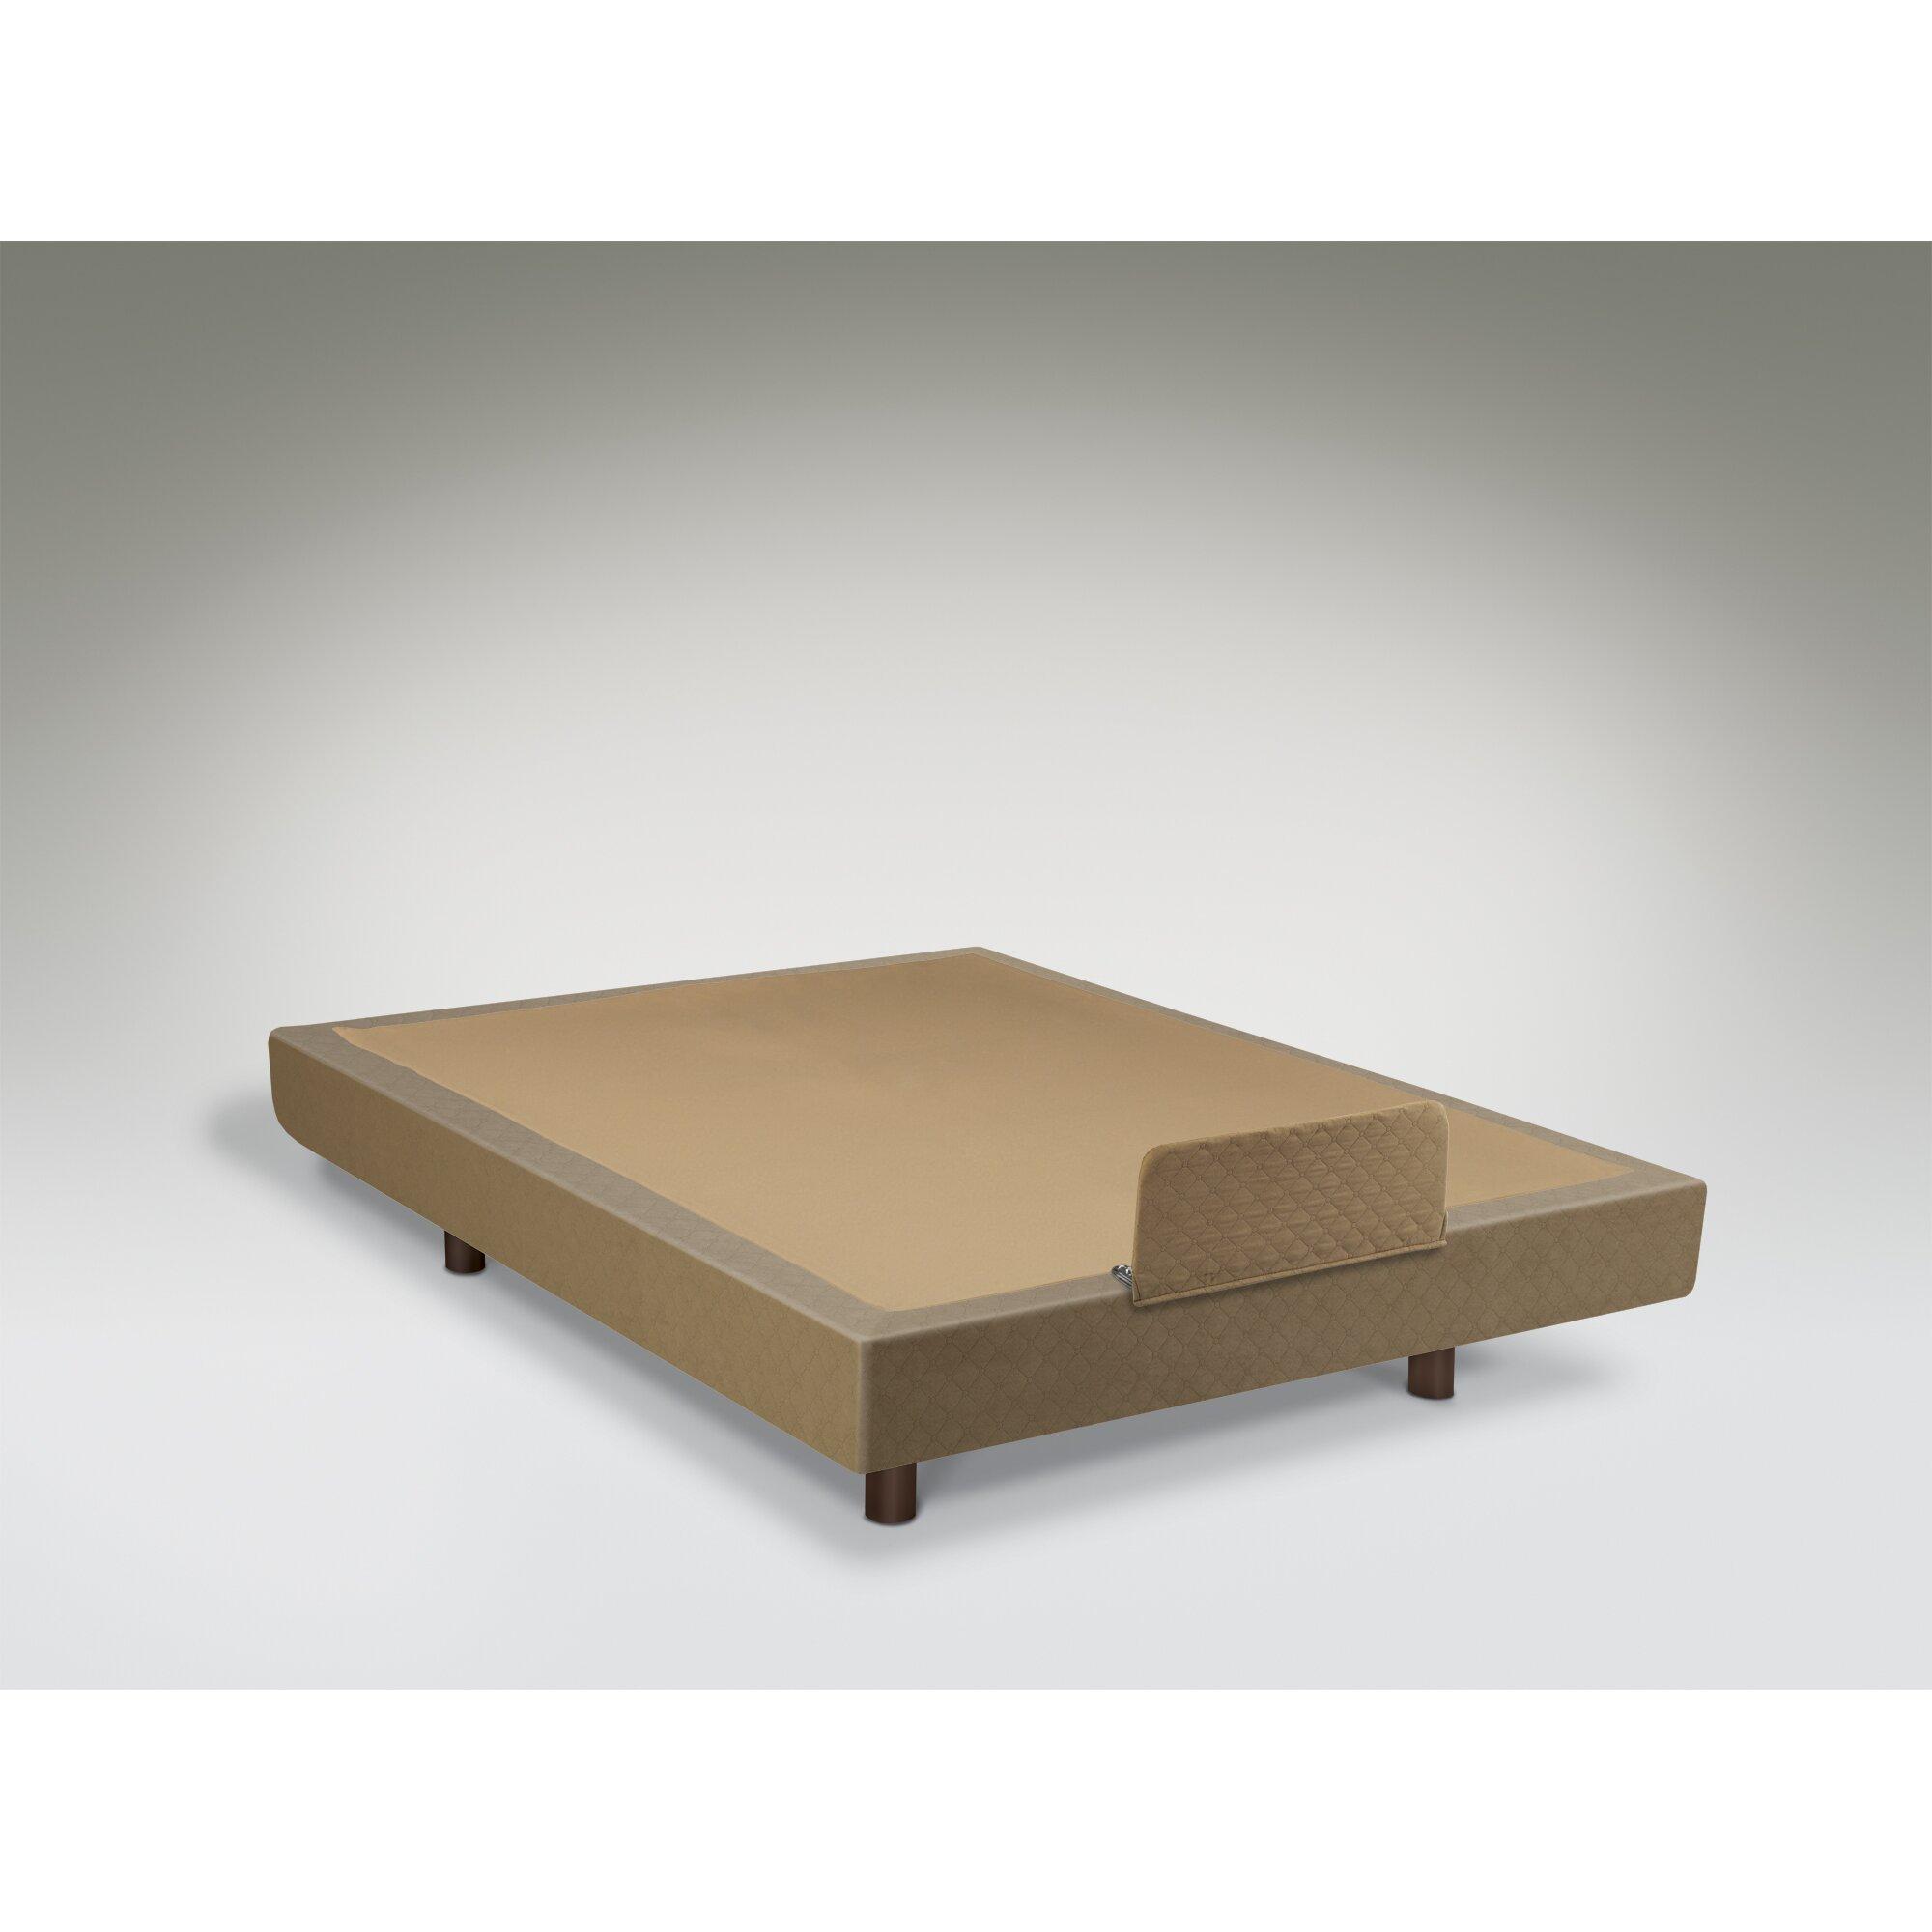 Grand fort base adjustable bed express corporate